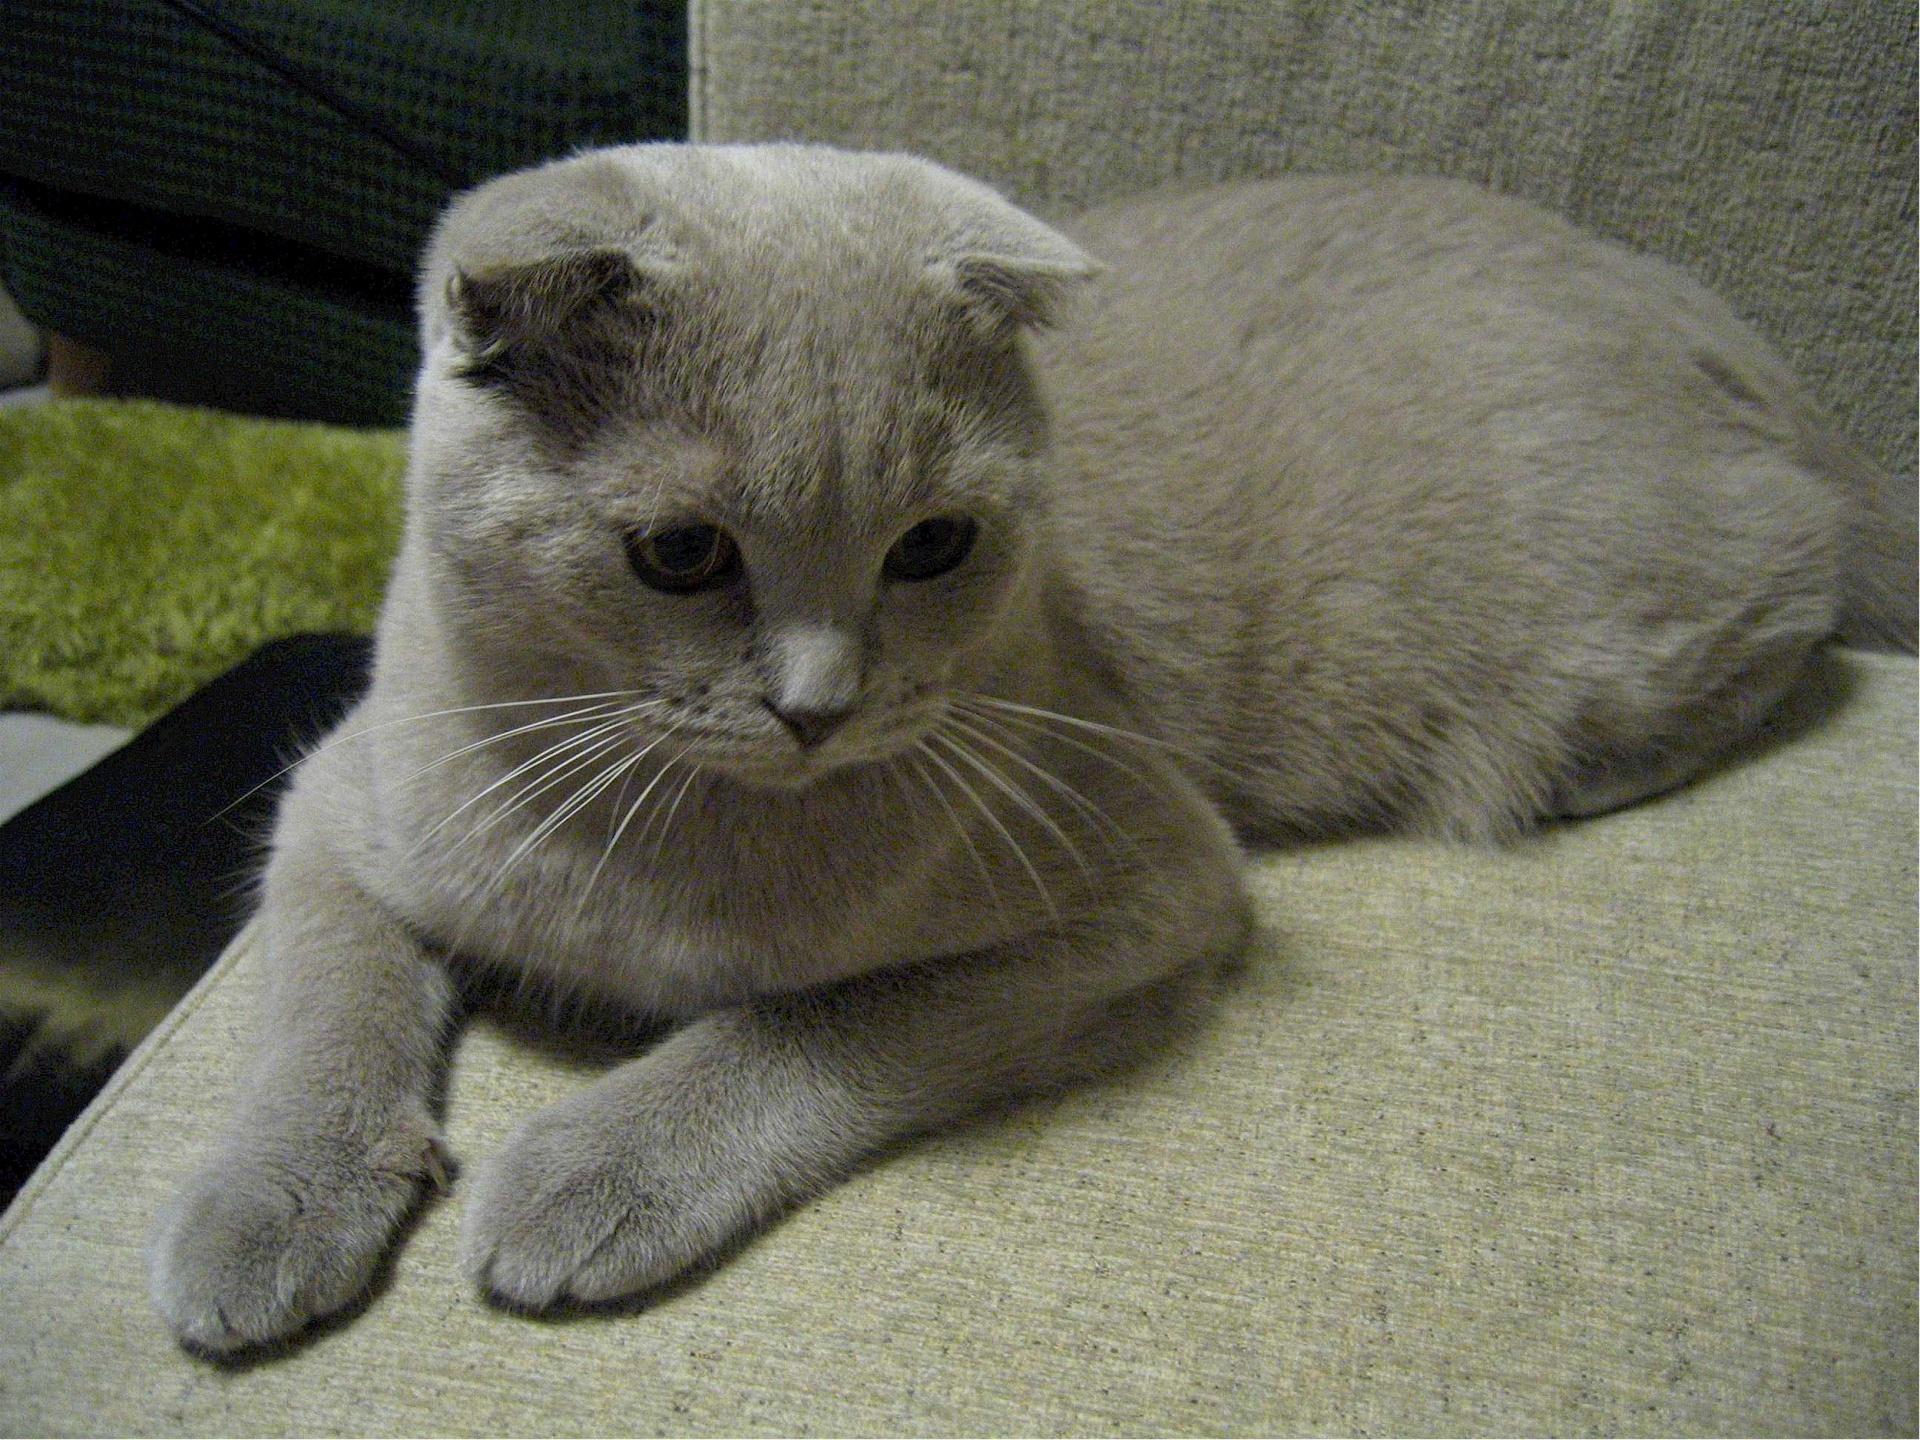 Relaxing cat photo